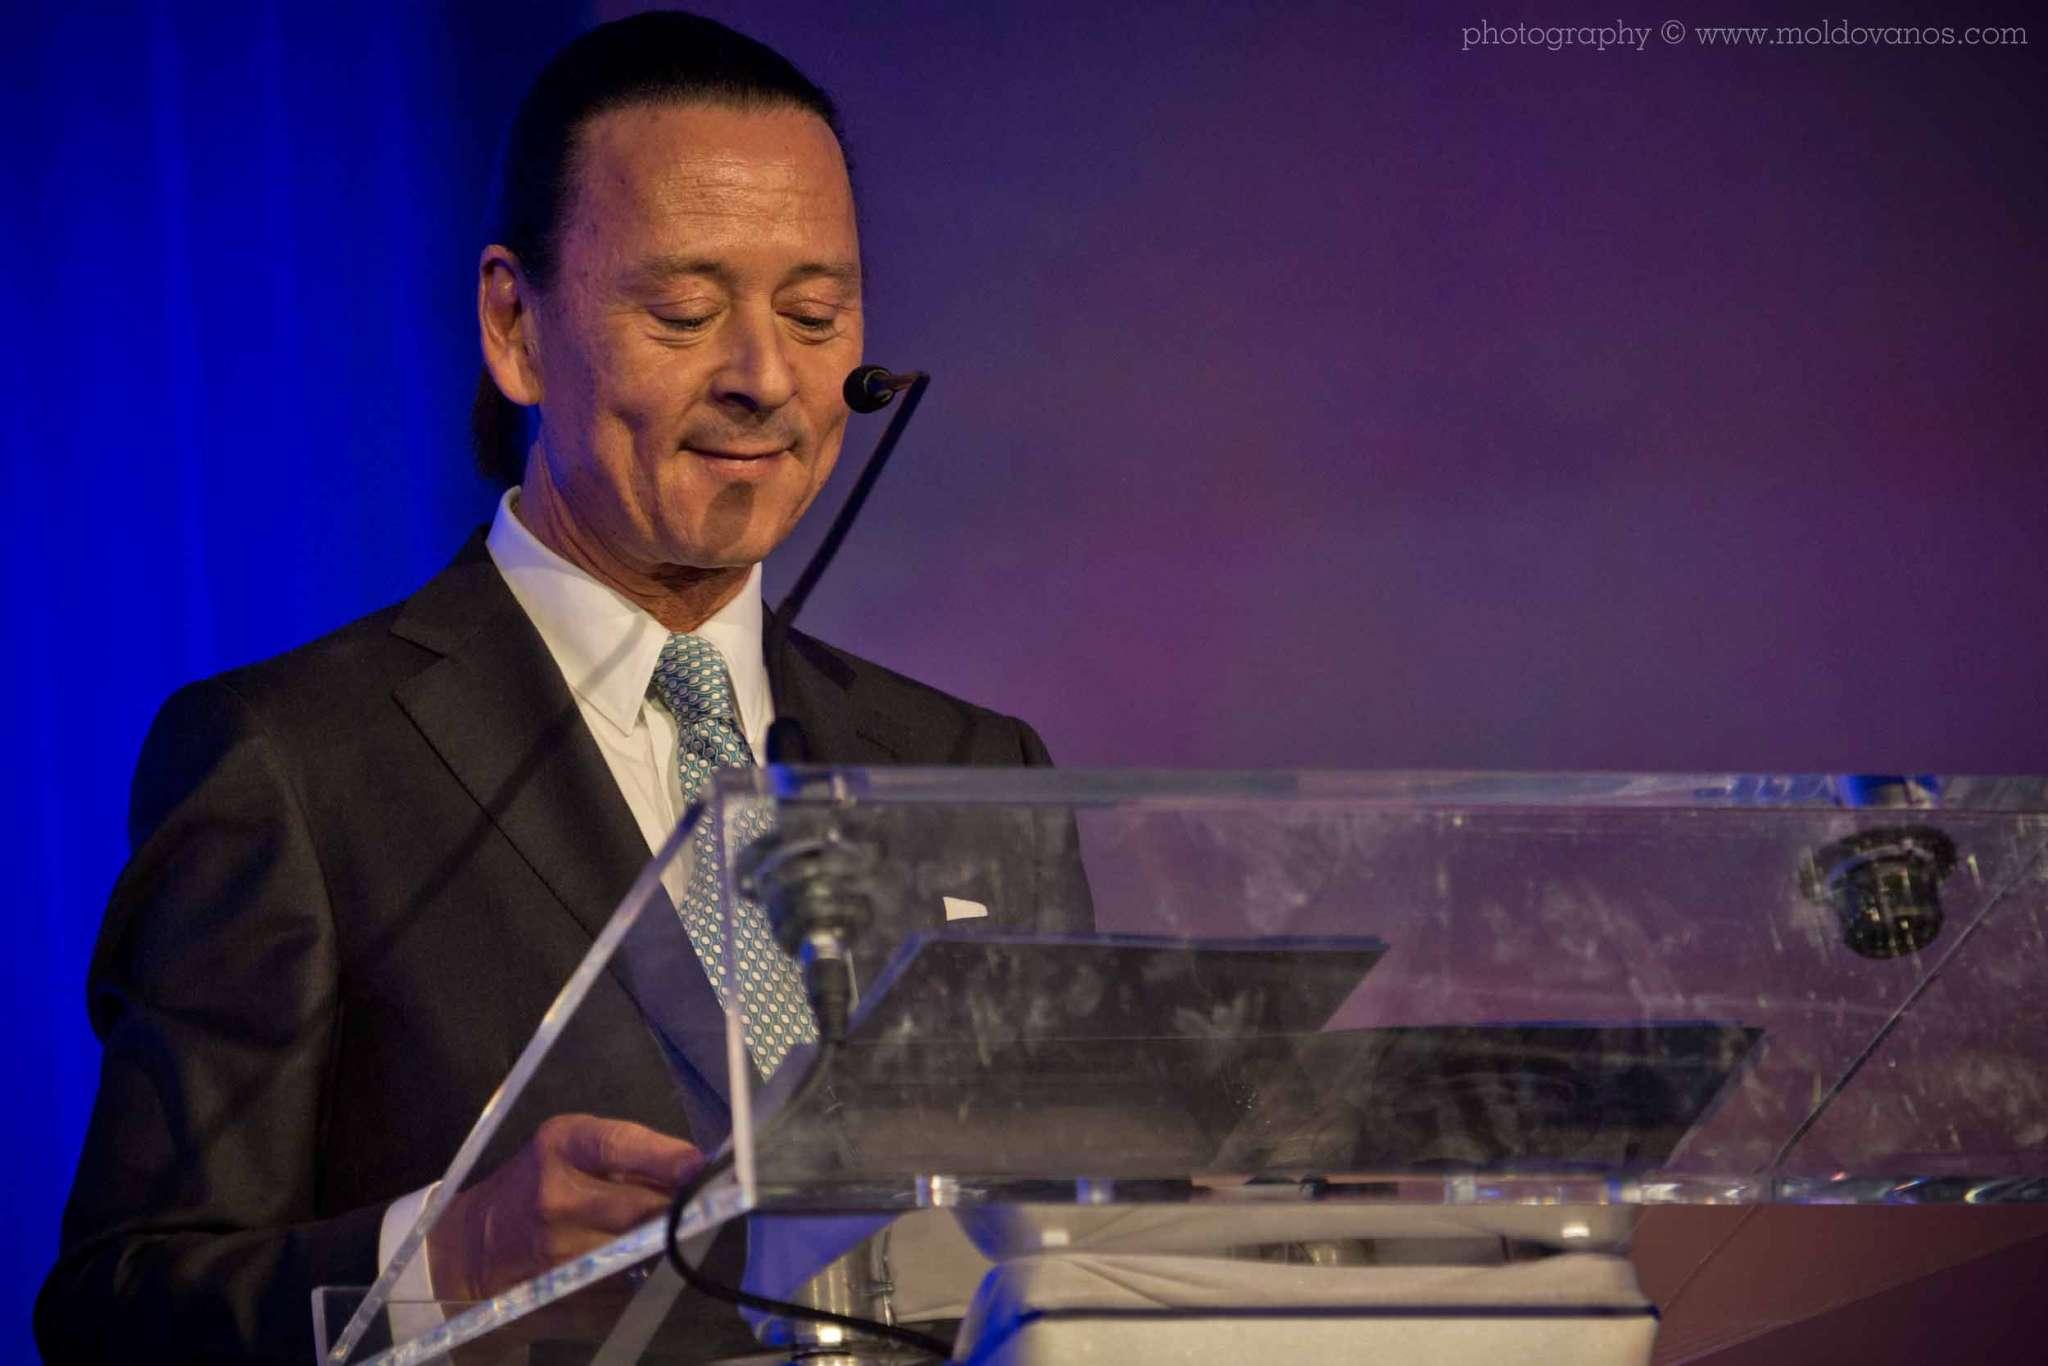 Leo Awards President Walter Daroshin- Event Photography by Paul Moldovanos © moldovanos.com